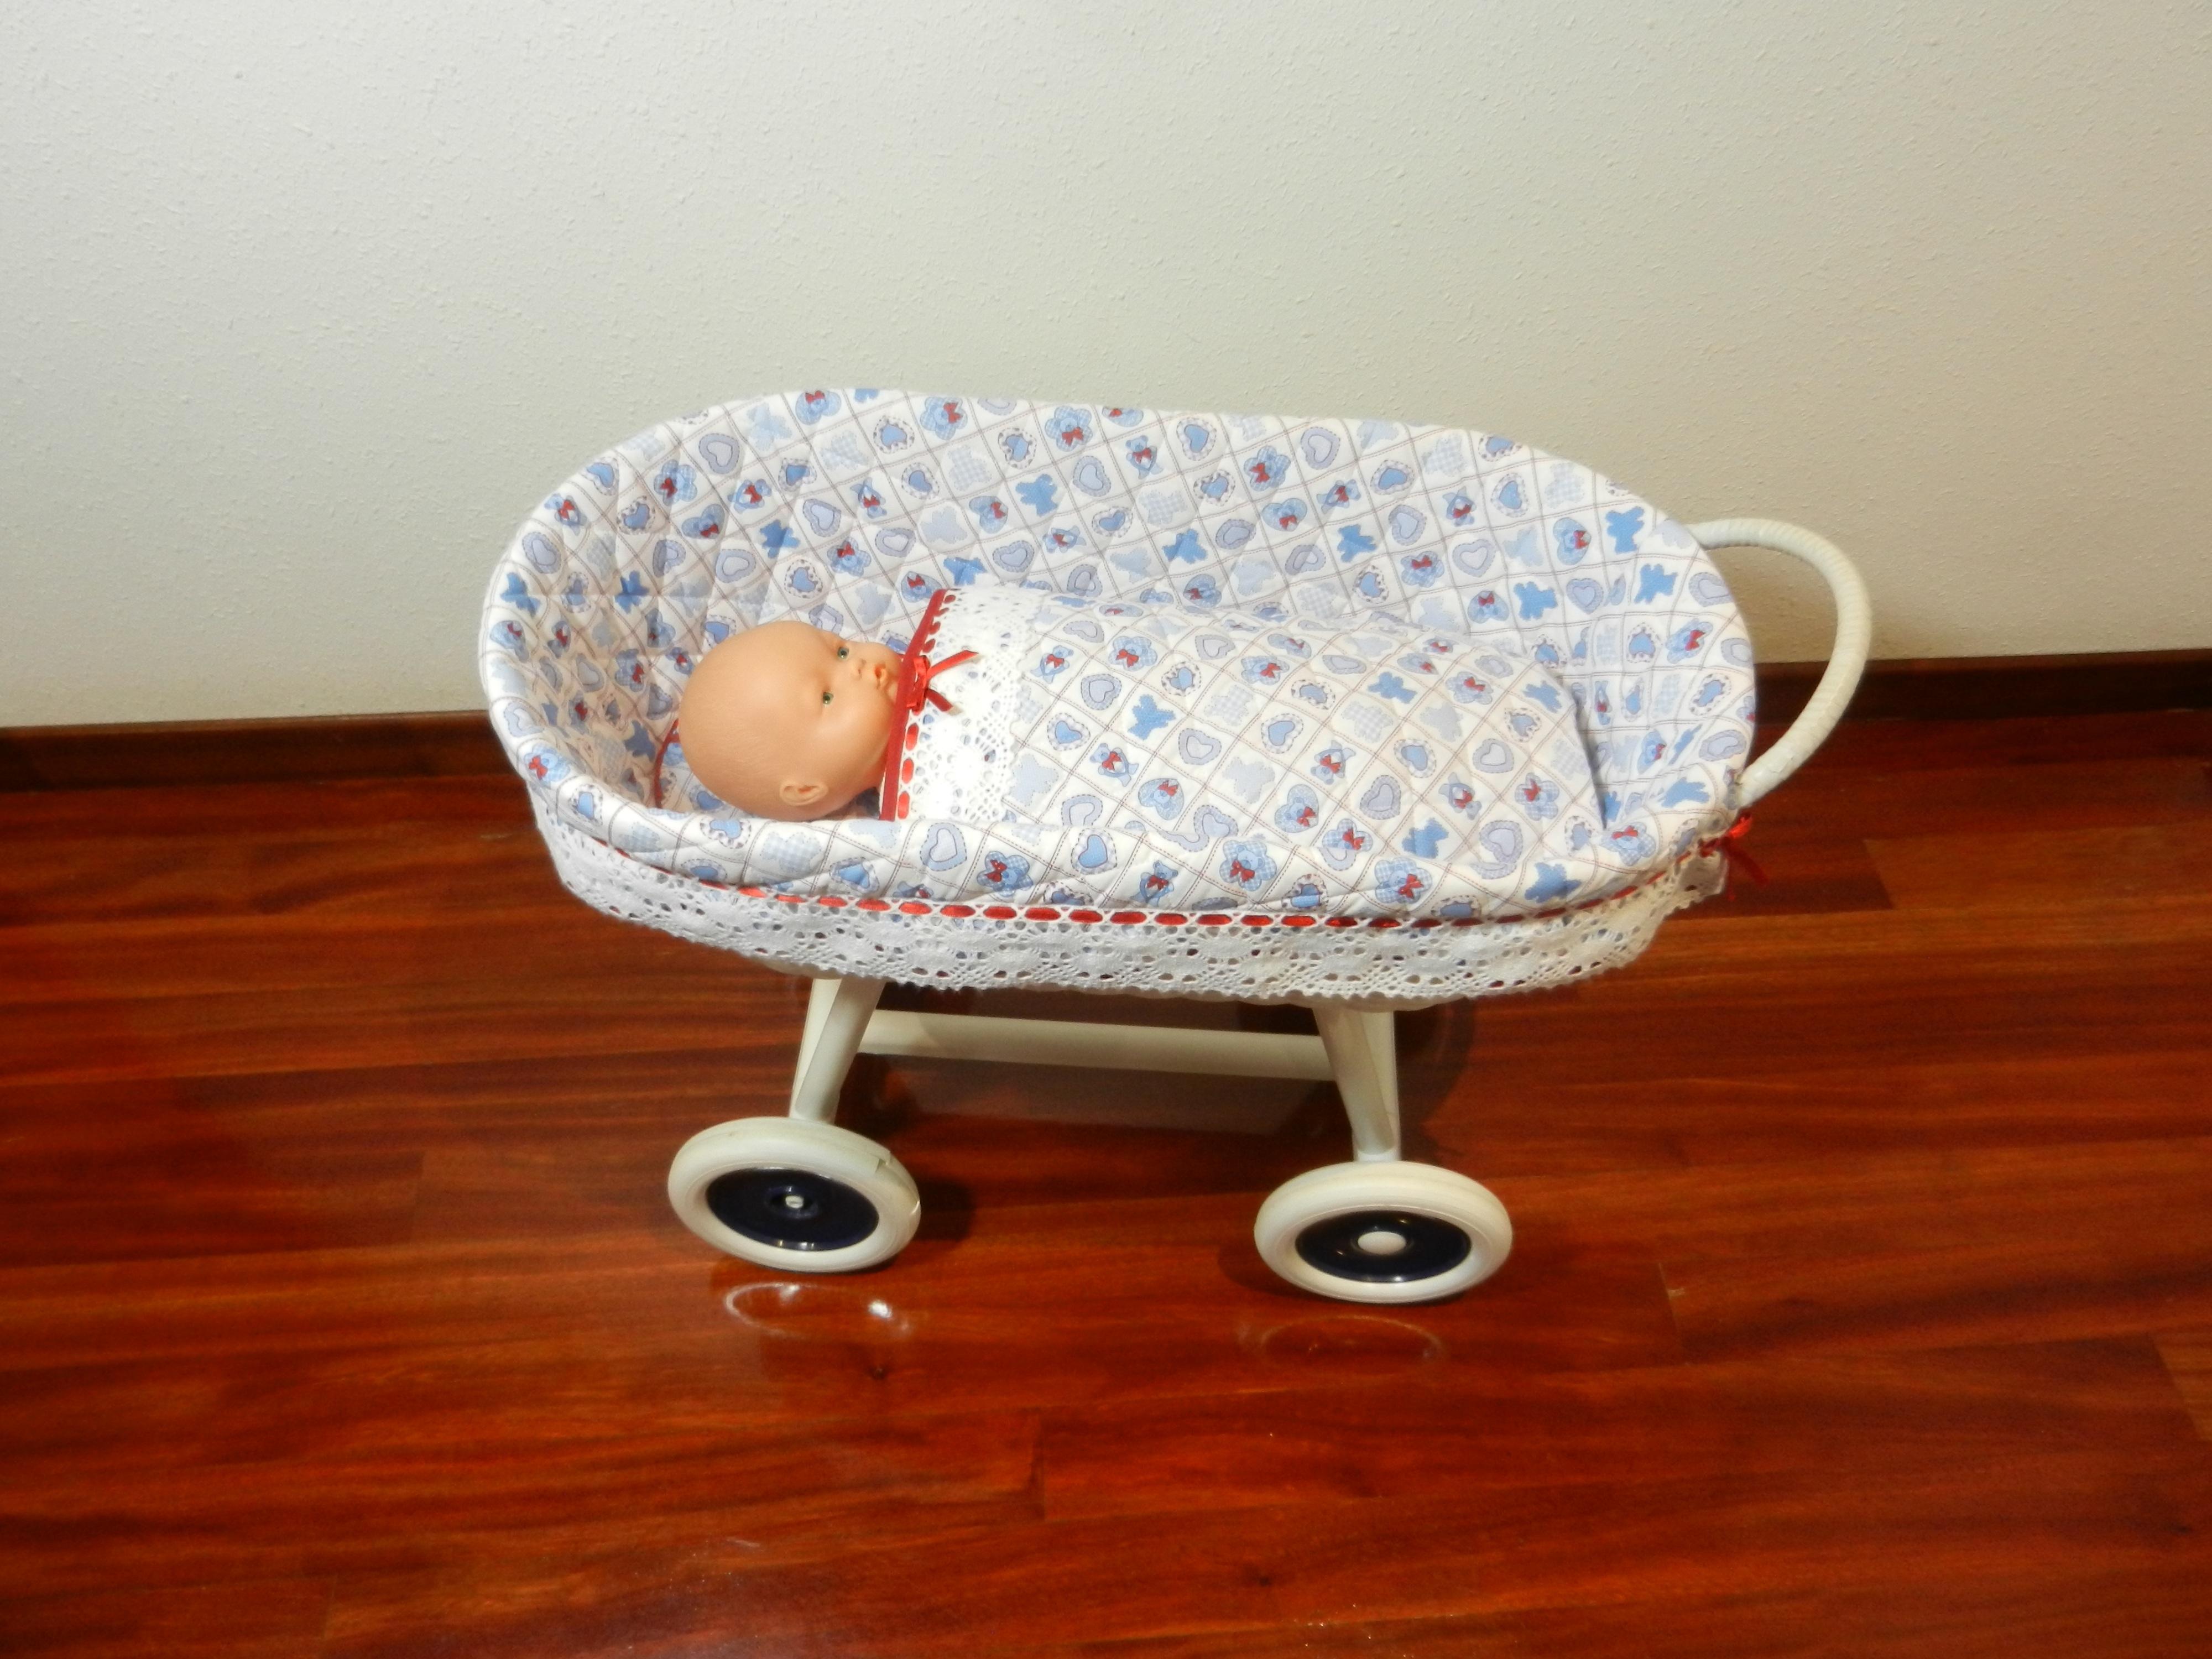 mesa silla mueble juguete material sof producto textil cama monigote de nieve moiss sof de estudio